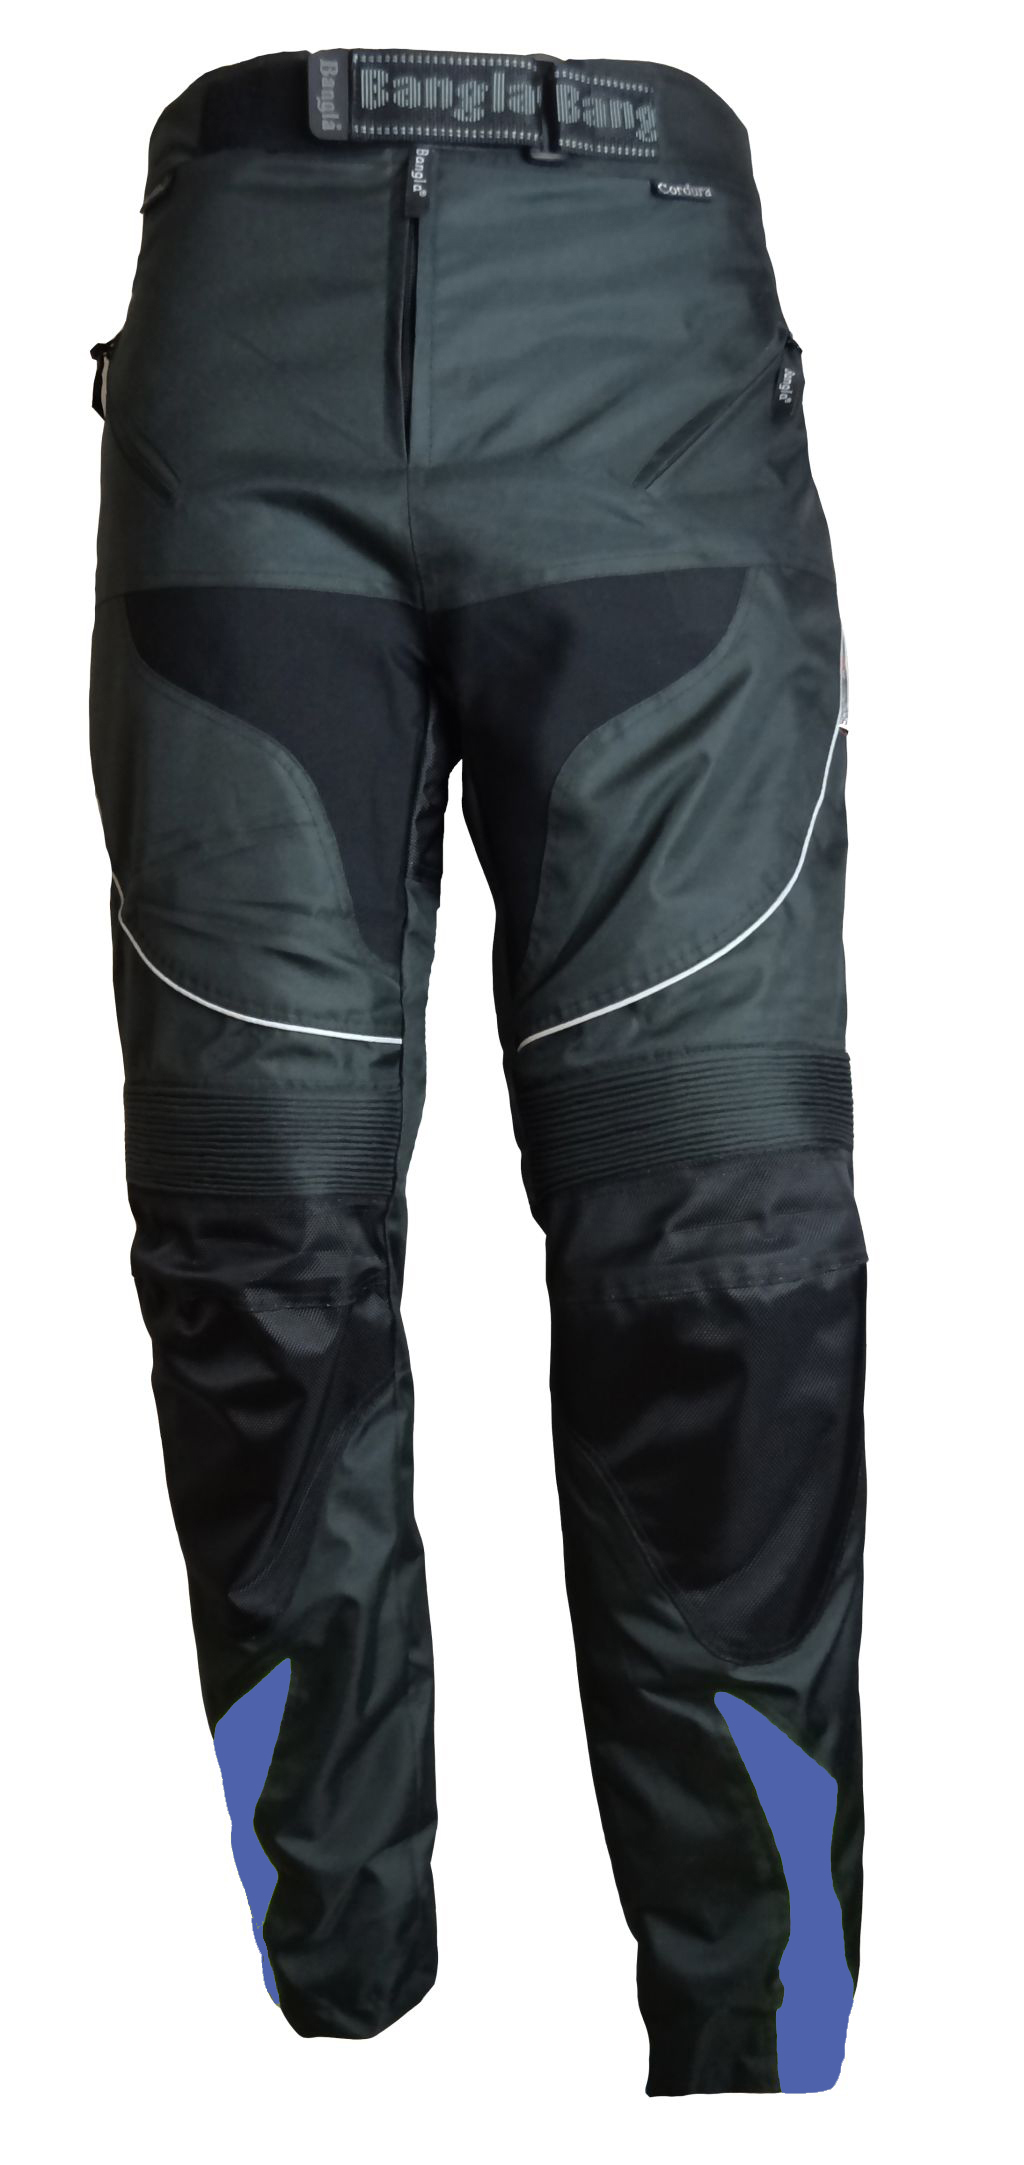 Bangla Motorrad Hose Motorradhose Textil Cordura schwarz mit blau S - 7 XL